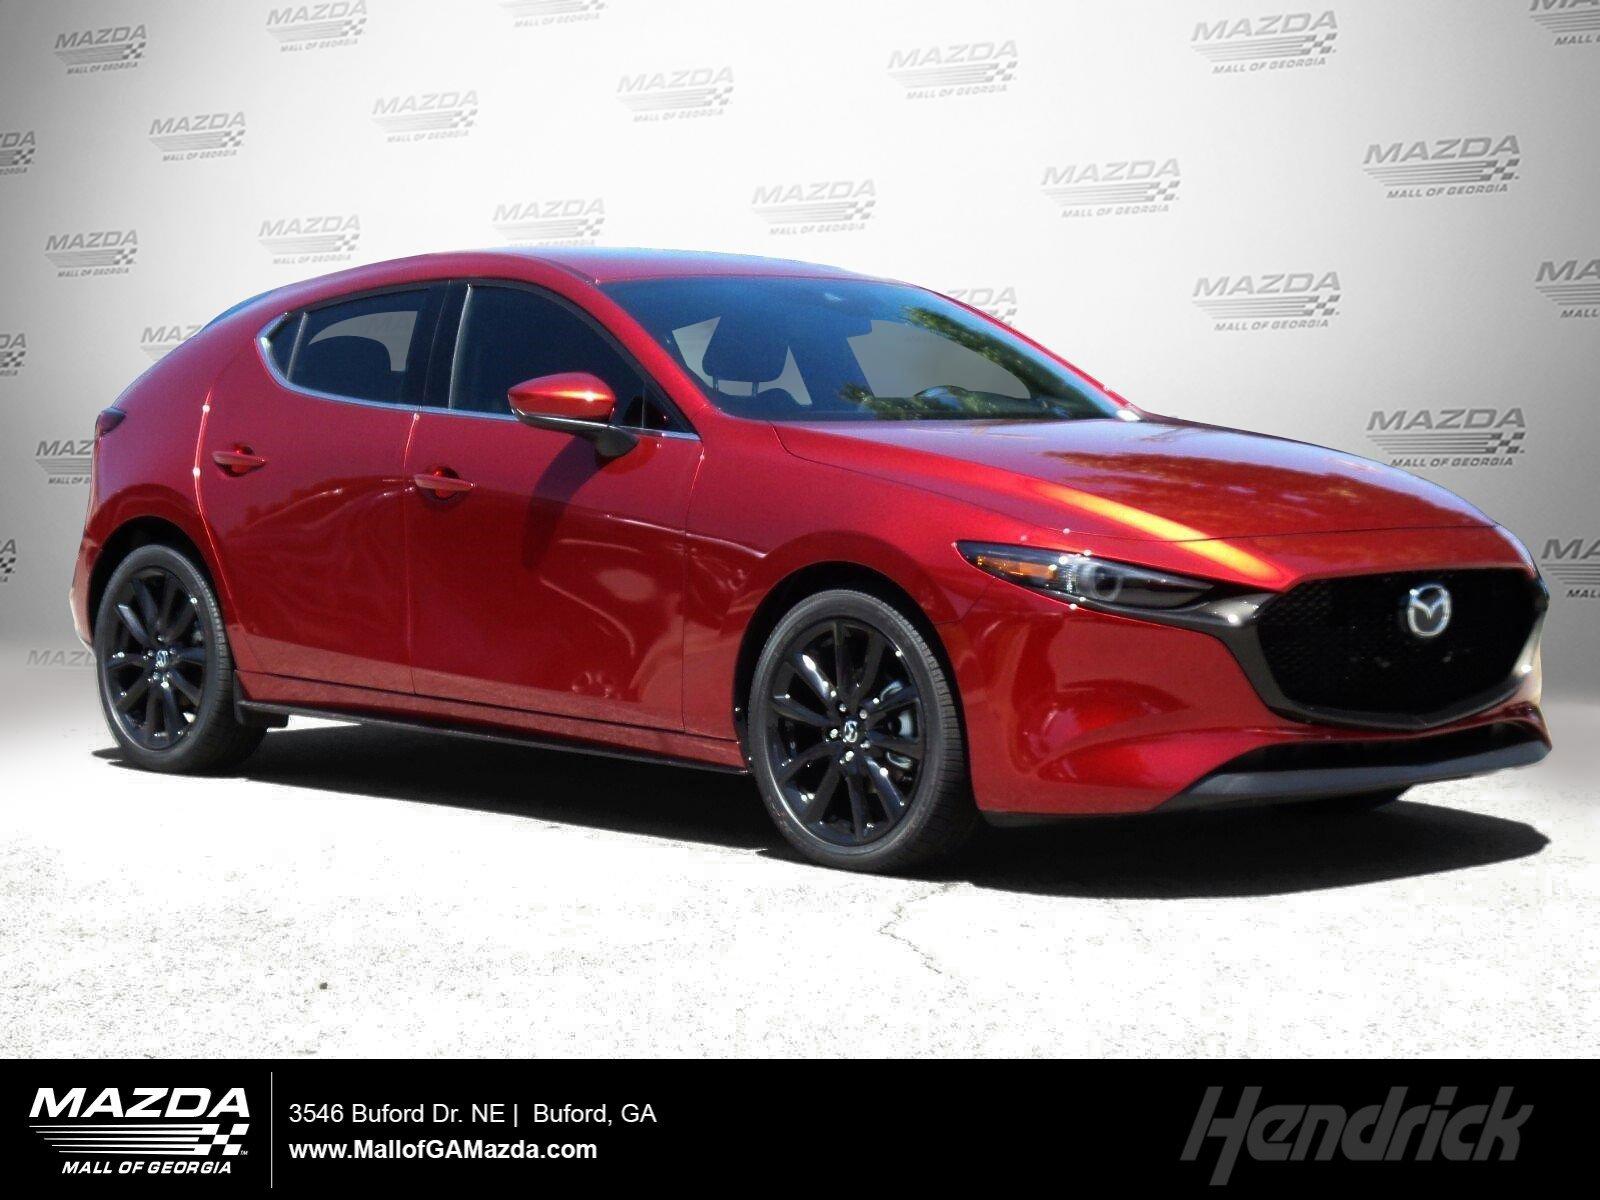 New 2019 Mazda3 Hatchback w/Premium Pkg